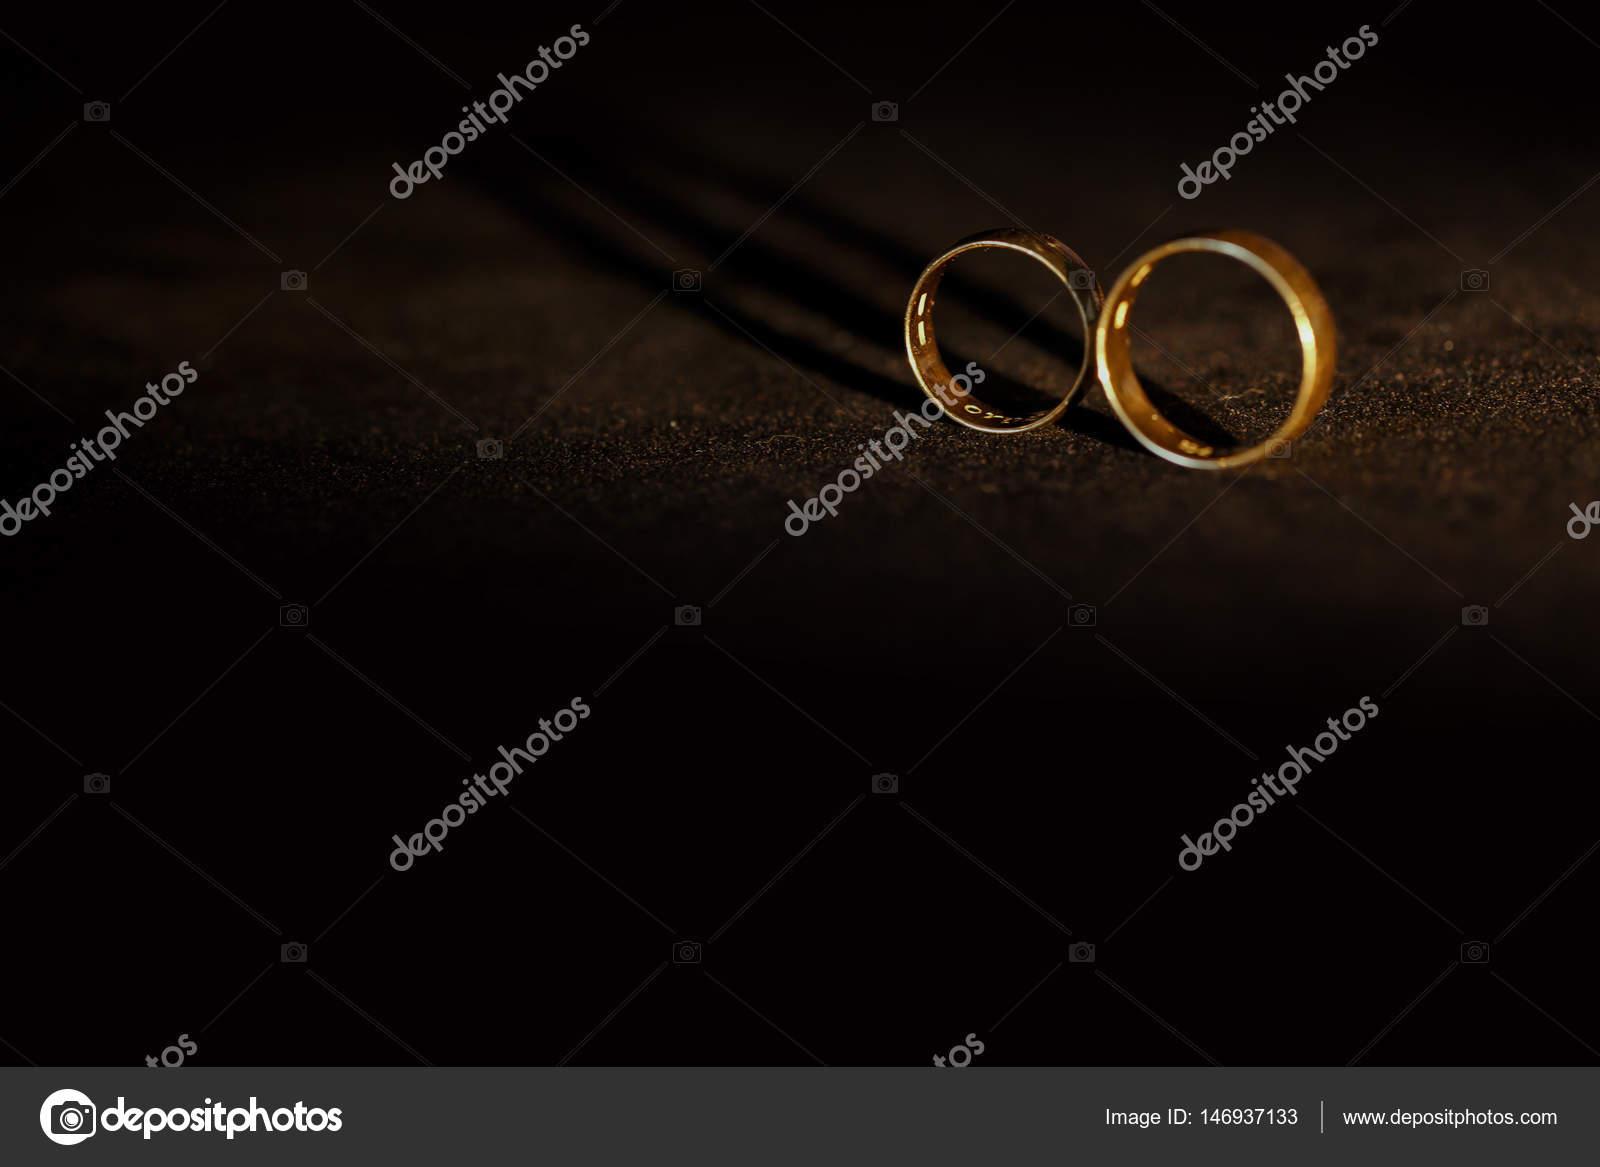 Wedding Rings With Names Inside Stock Photo C Olexiysyrotkin